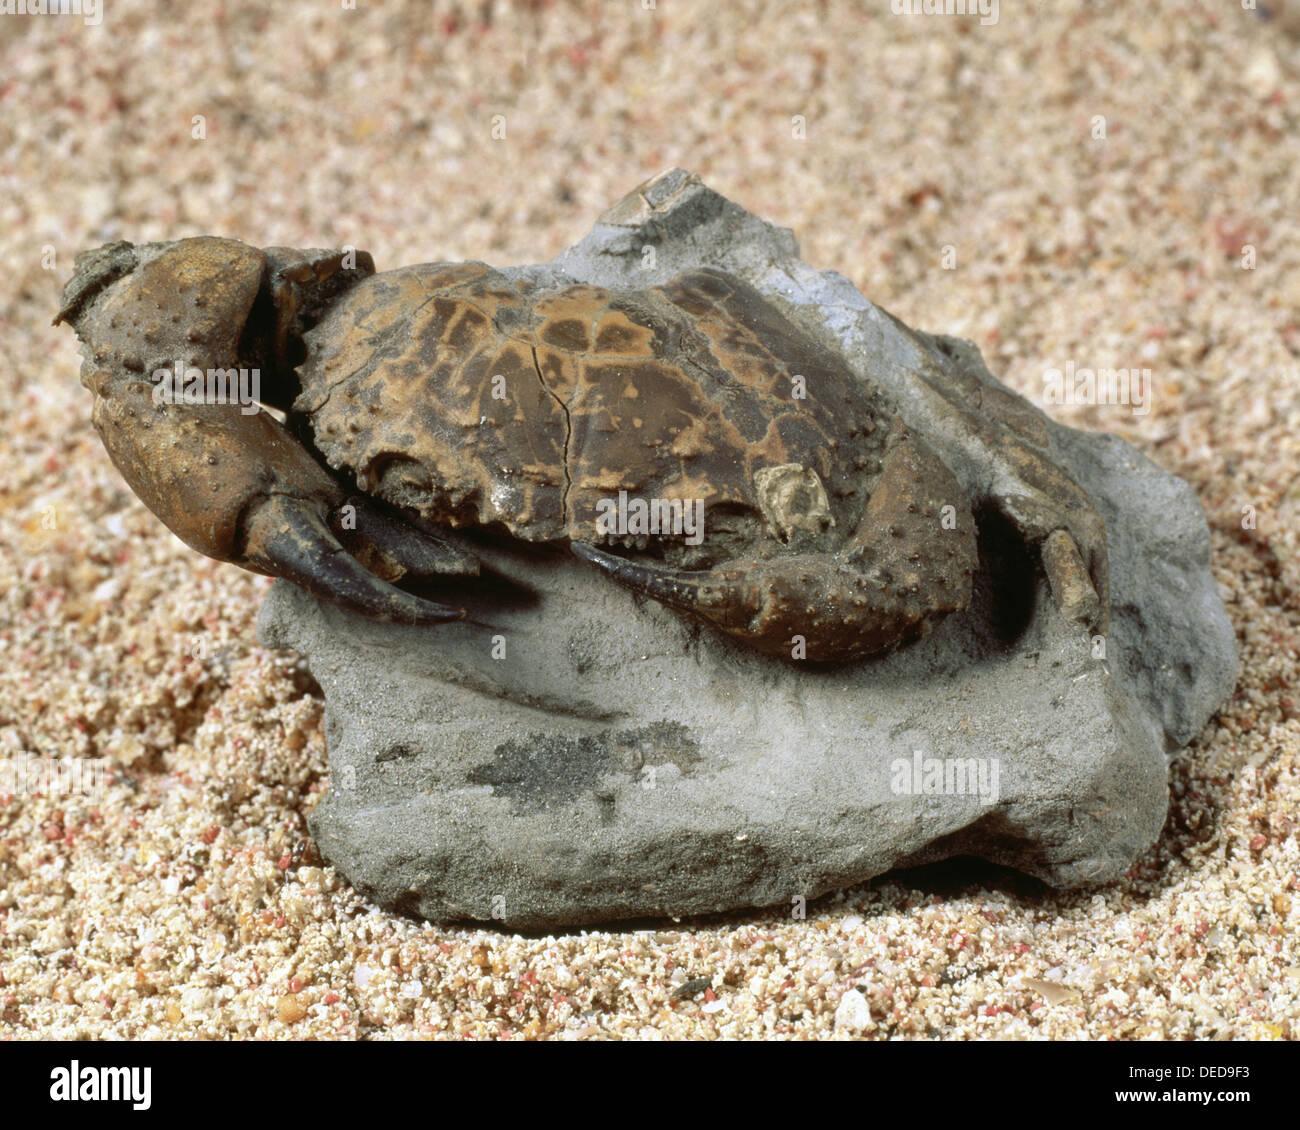 Eriphia cochii fossil (10cm long). Pliocene. Italy. - Stock Image